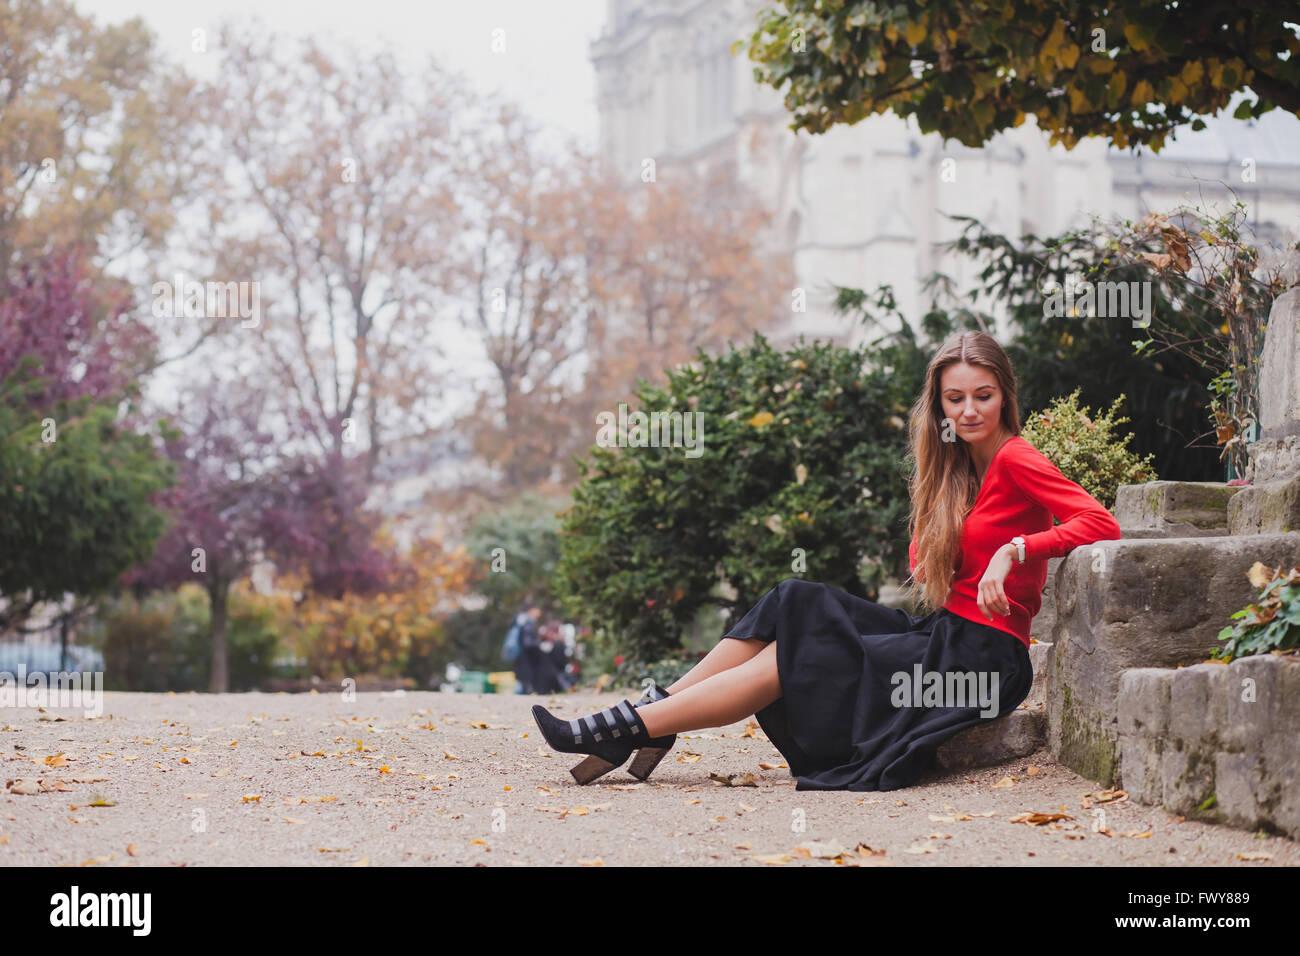 Bella mujer en rojo, retrato de moda joven modelo caucásicos con pelo largo sentado solo, psicología concepto Imagen De Stock